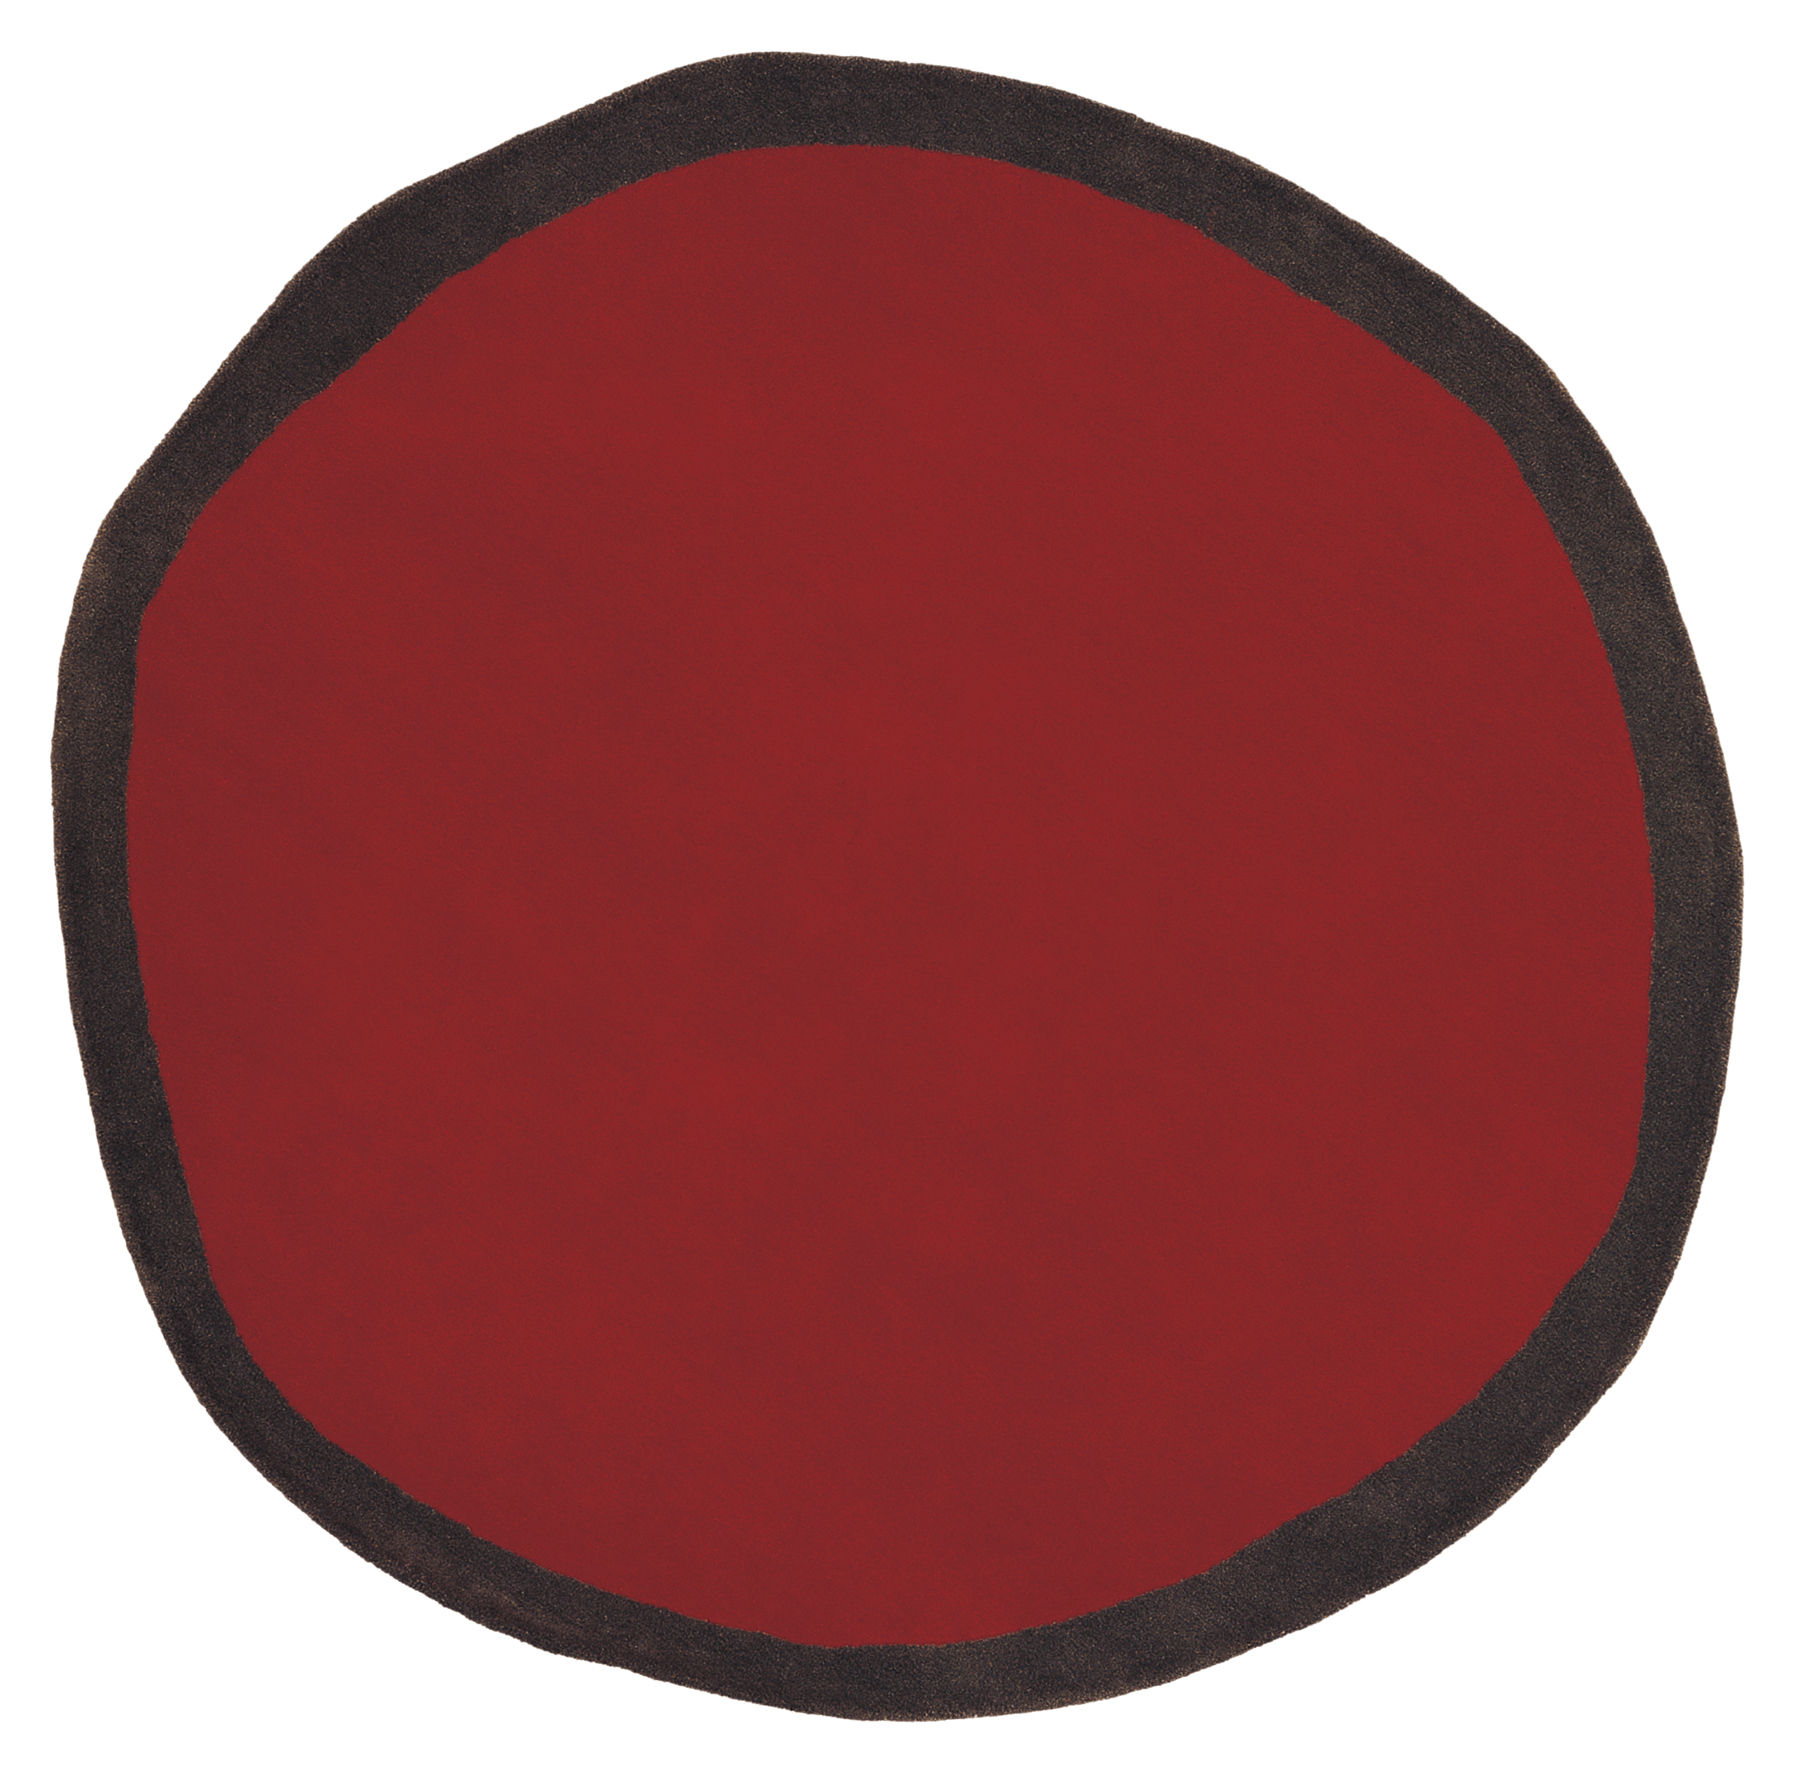 Furniture - Carpets - Aros Rug by Nanimarquina - Red - Wool